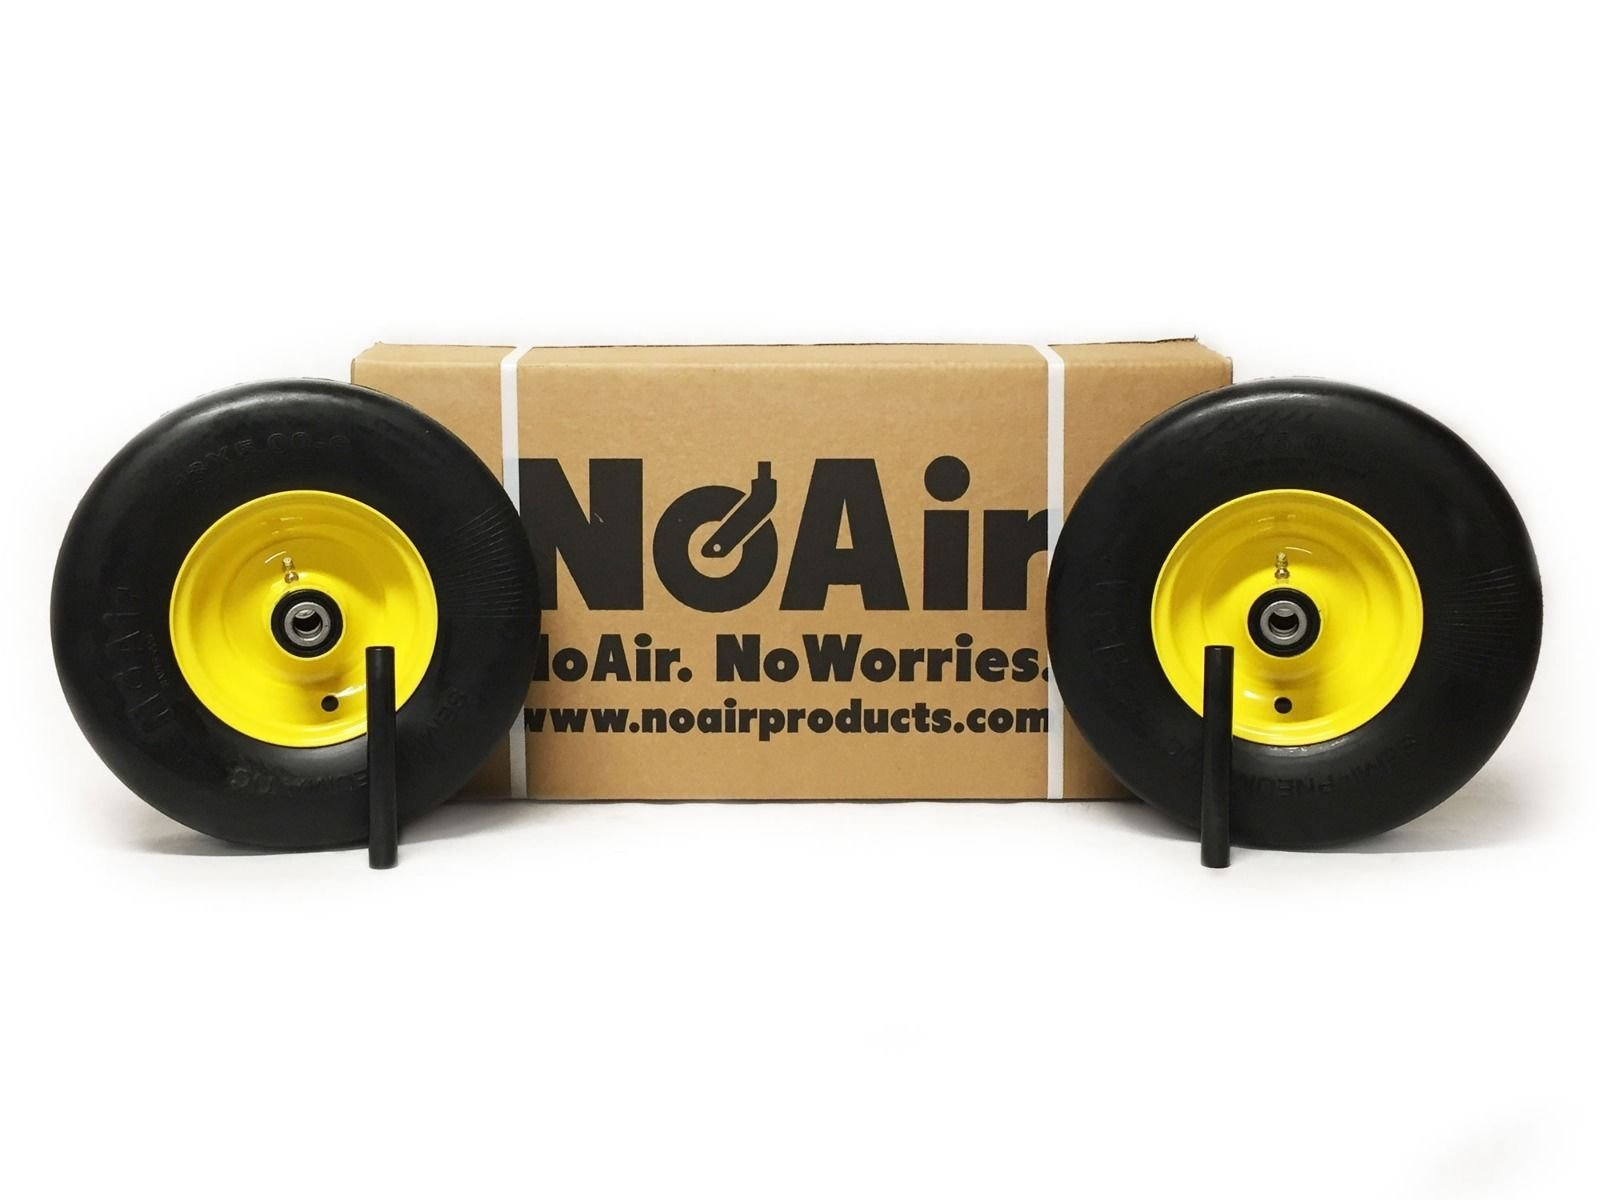 NoAir (2) John Deere Flat Free Wheel Assemblies 13x5.00-6 Yellow Replaces TCA 13769